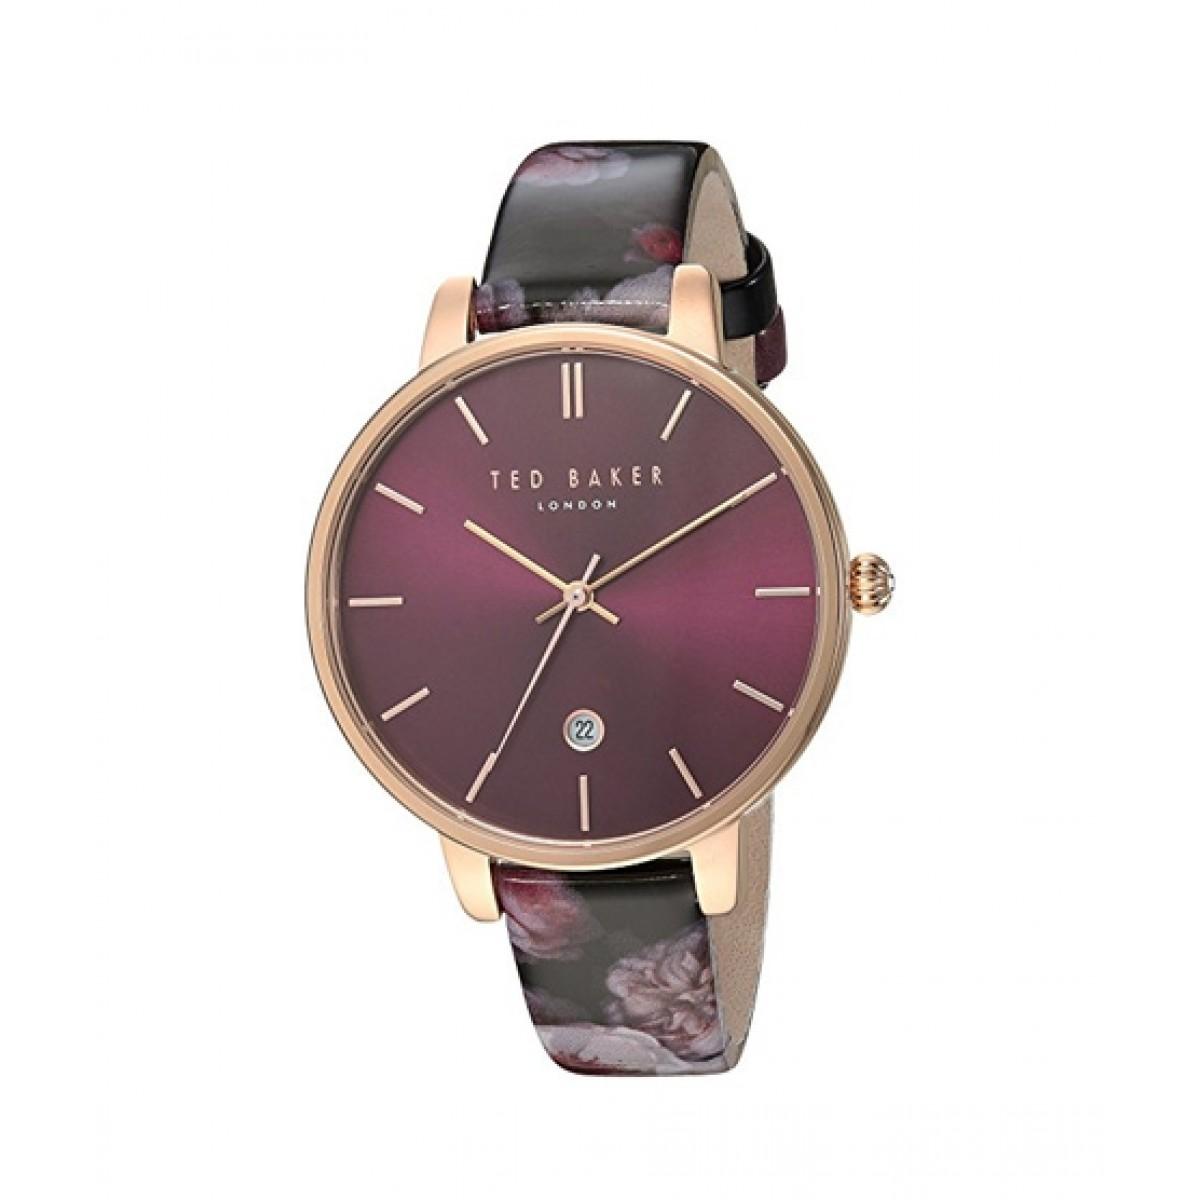 0e5741fcc08 Ted Baker Kate Women s Watch Price in Pakistan